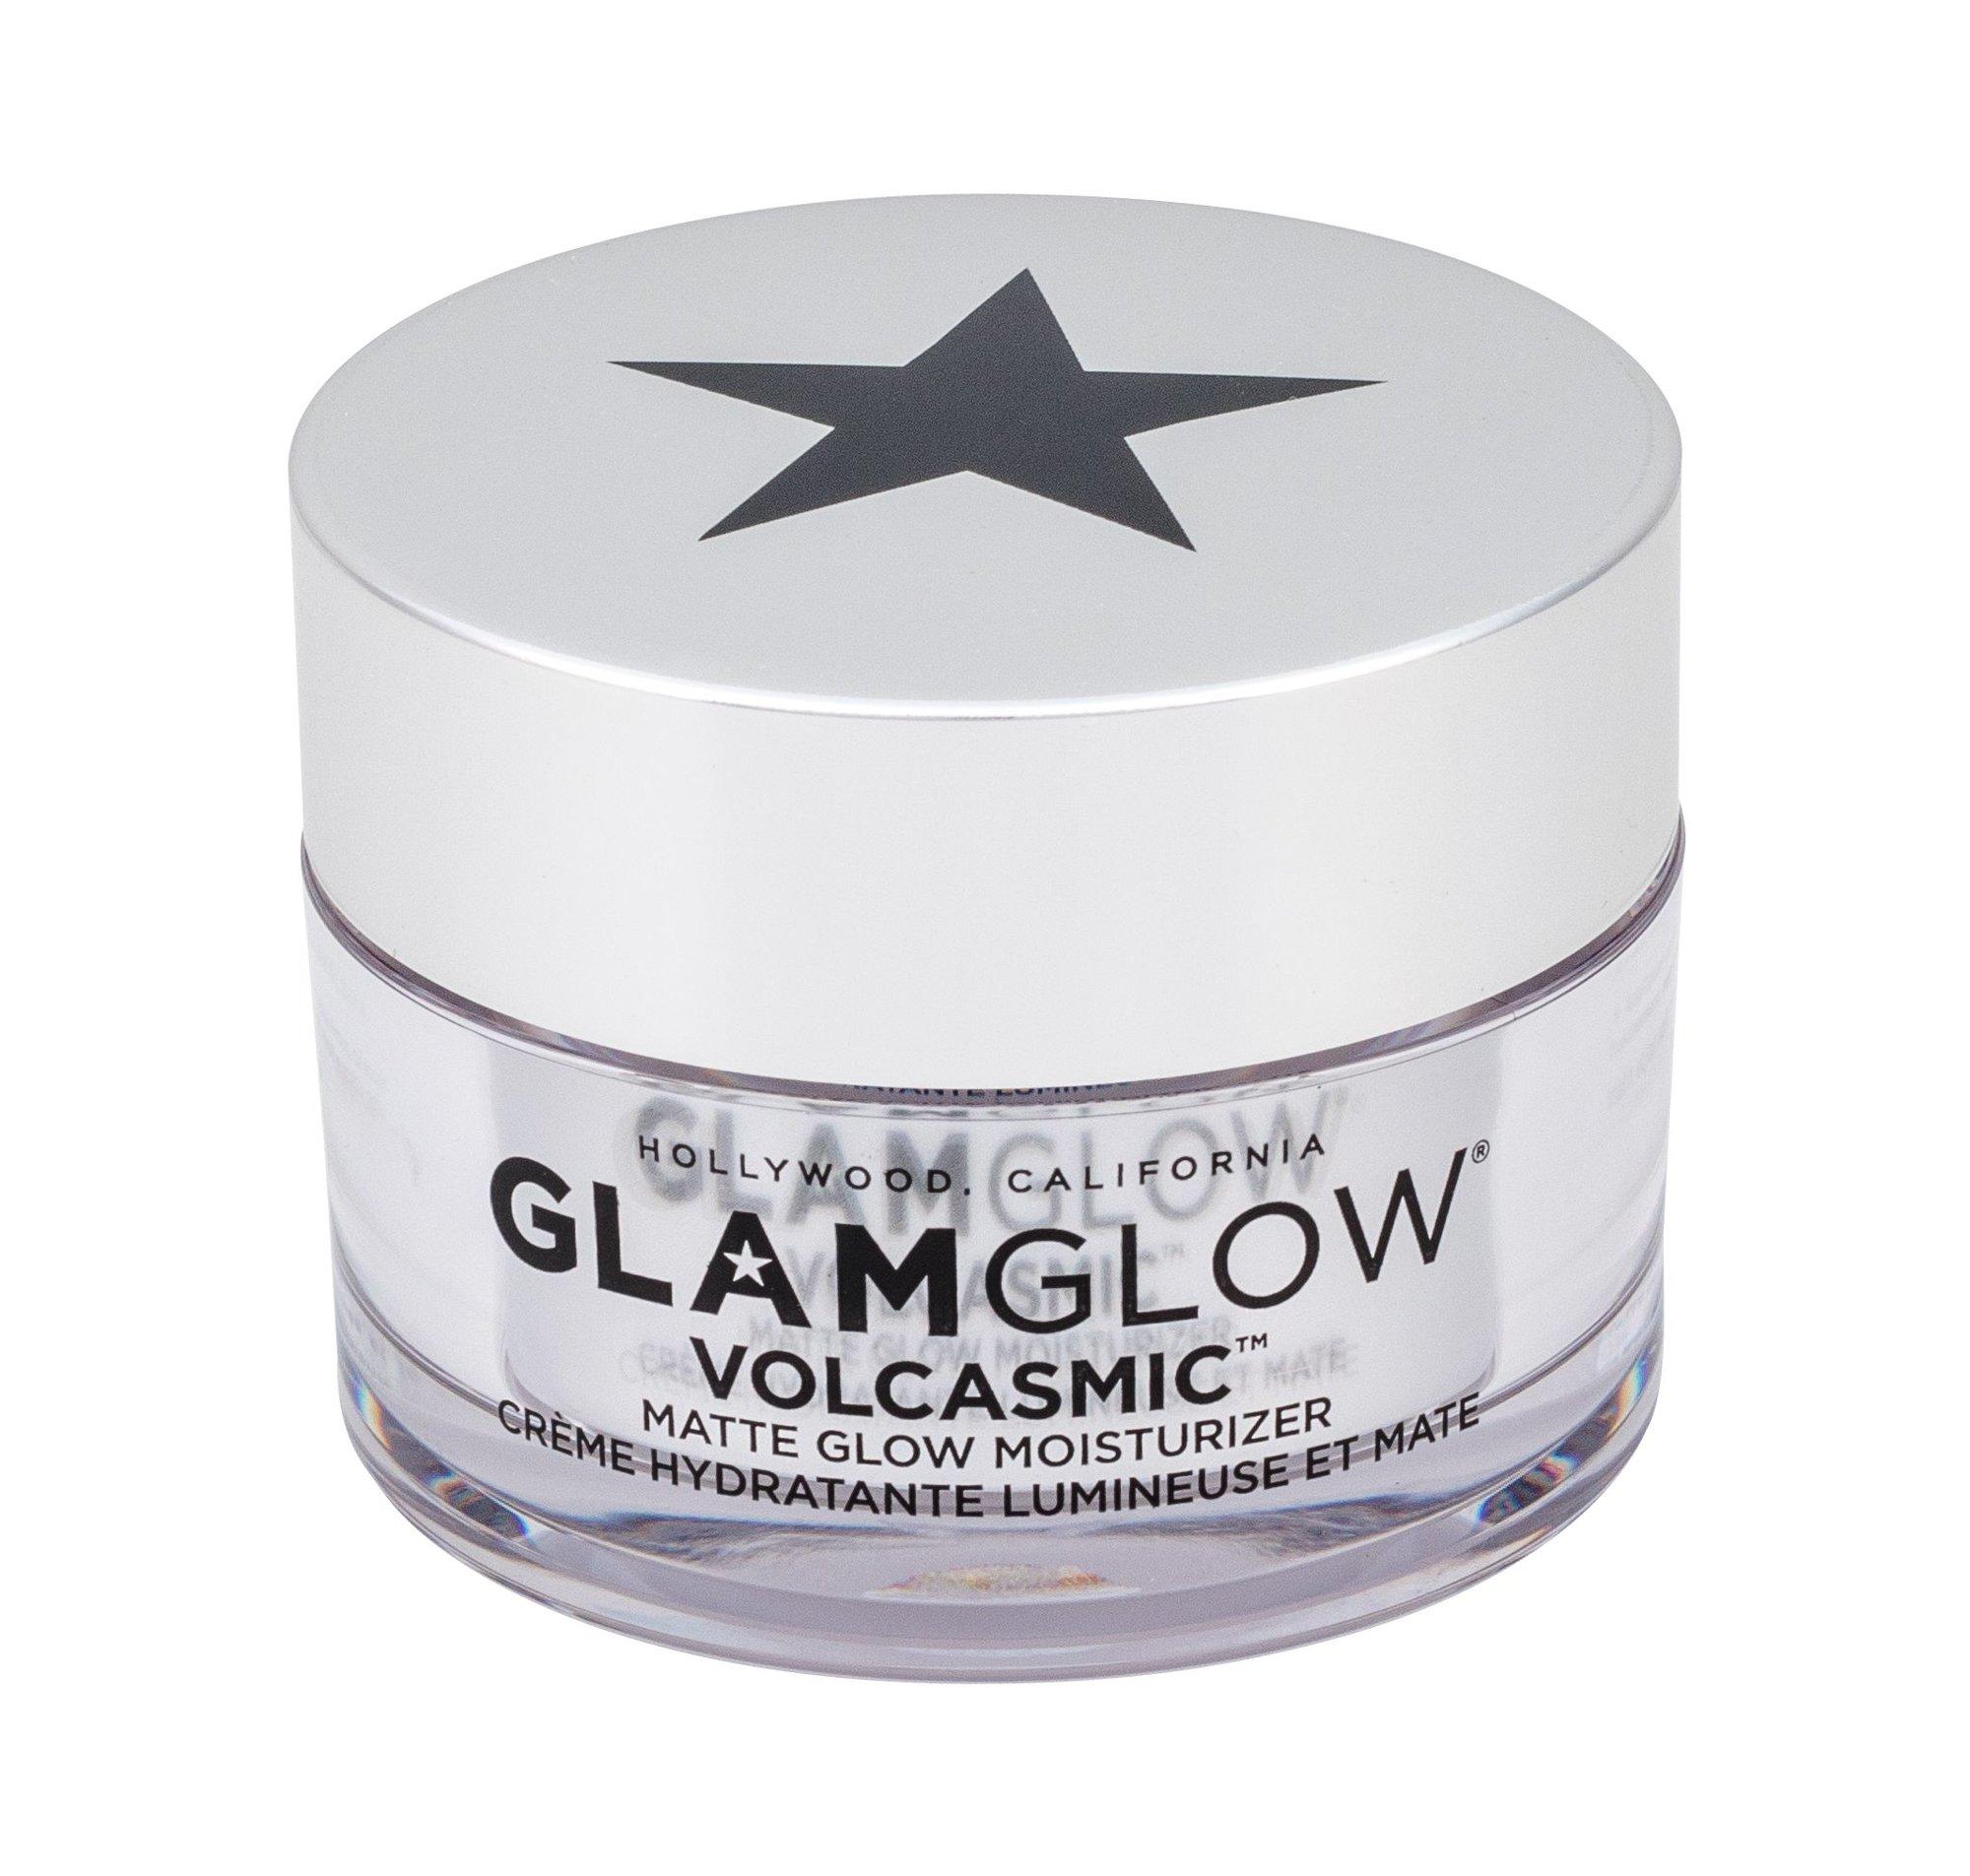 Glam Glow Volcasmic Cosmetic 50ml